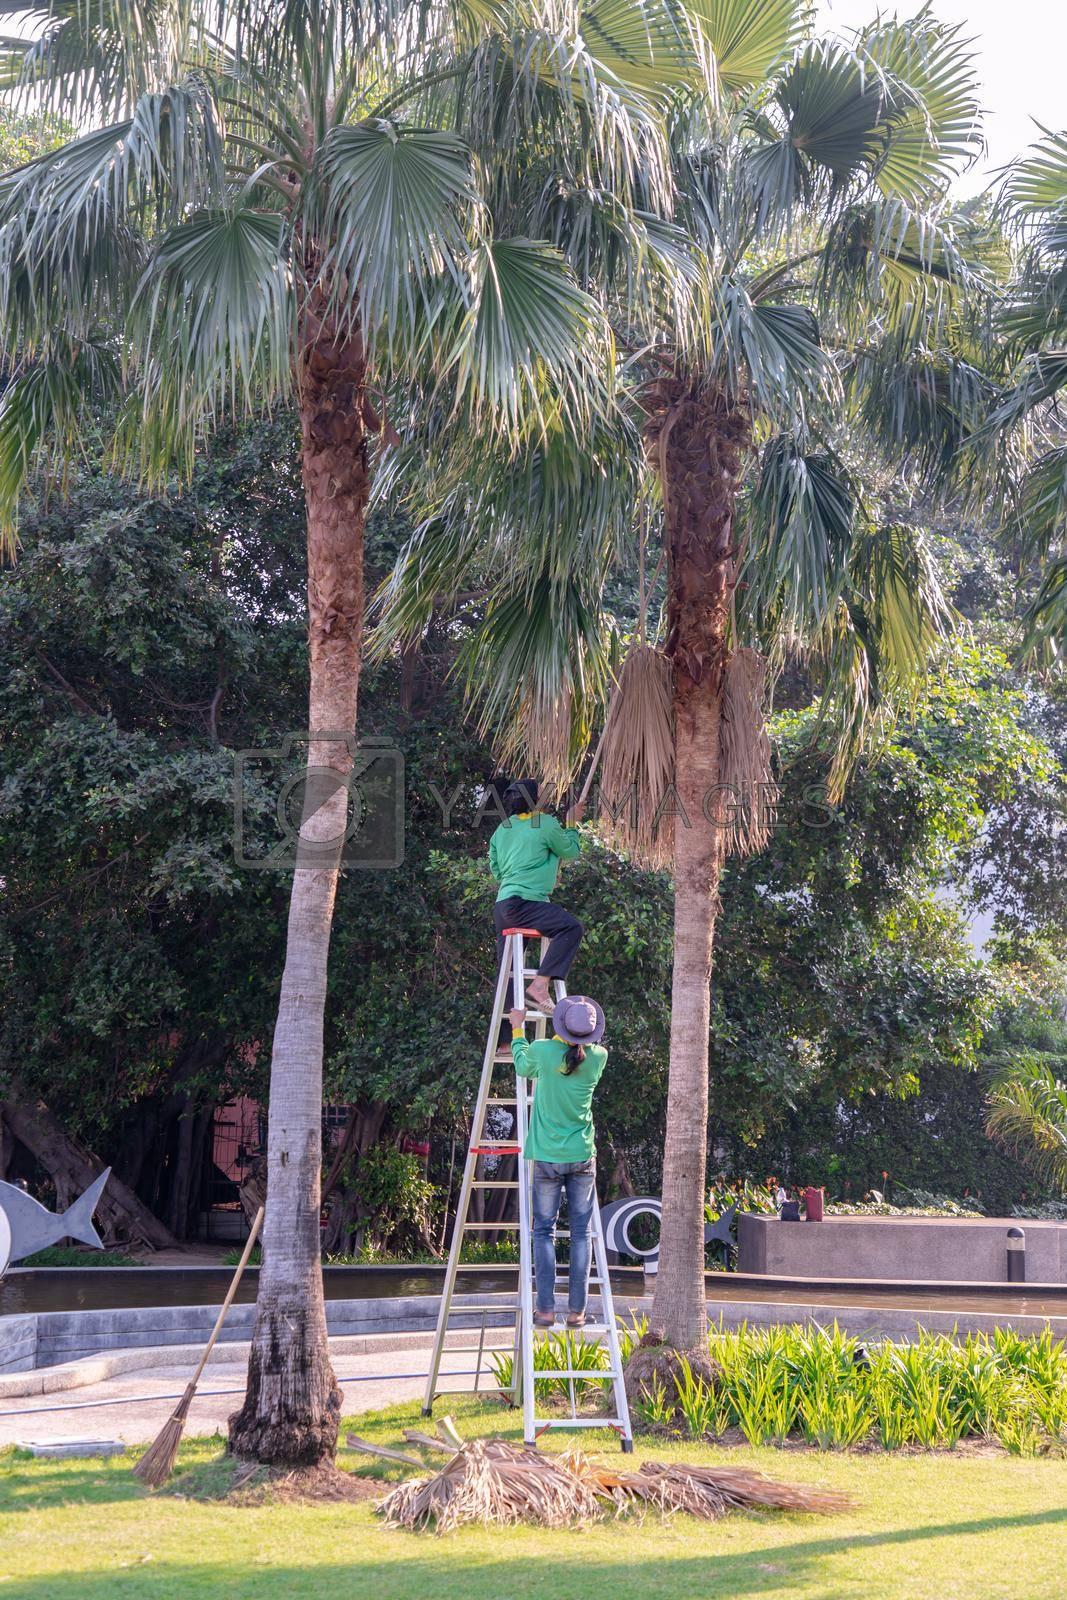 Bangkok, Thailand - Jan 14, 2021 : The gardener climbs Climb the ladder cut the branches at the top. Selective focus.